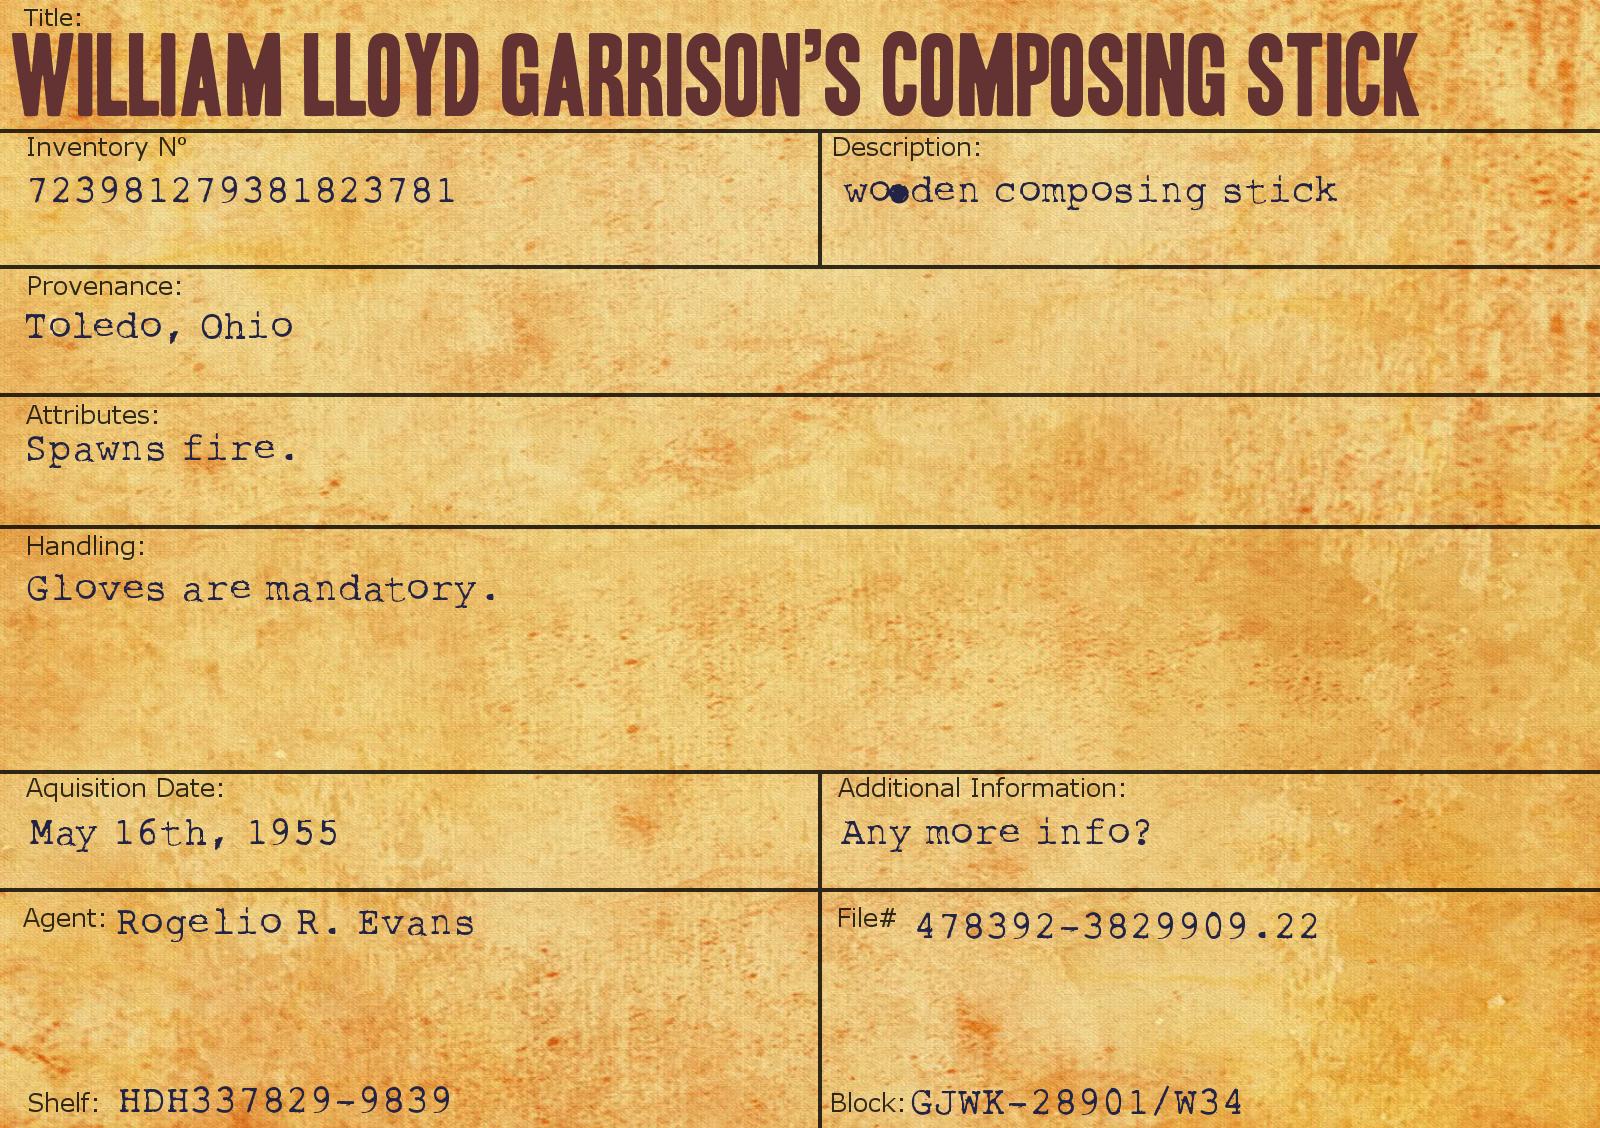 William Lloyd Garrison's Composing Stick